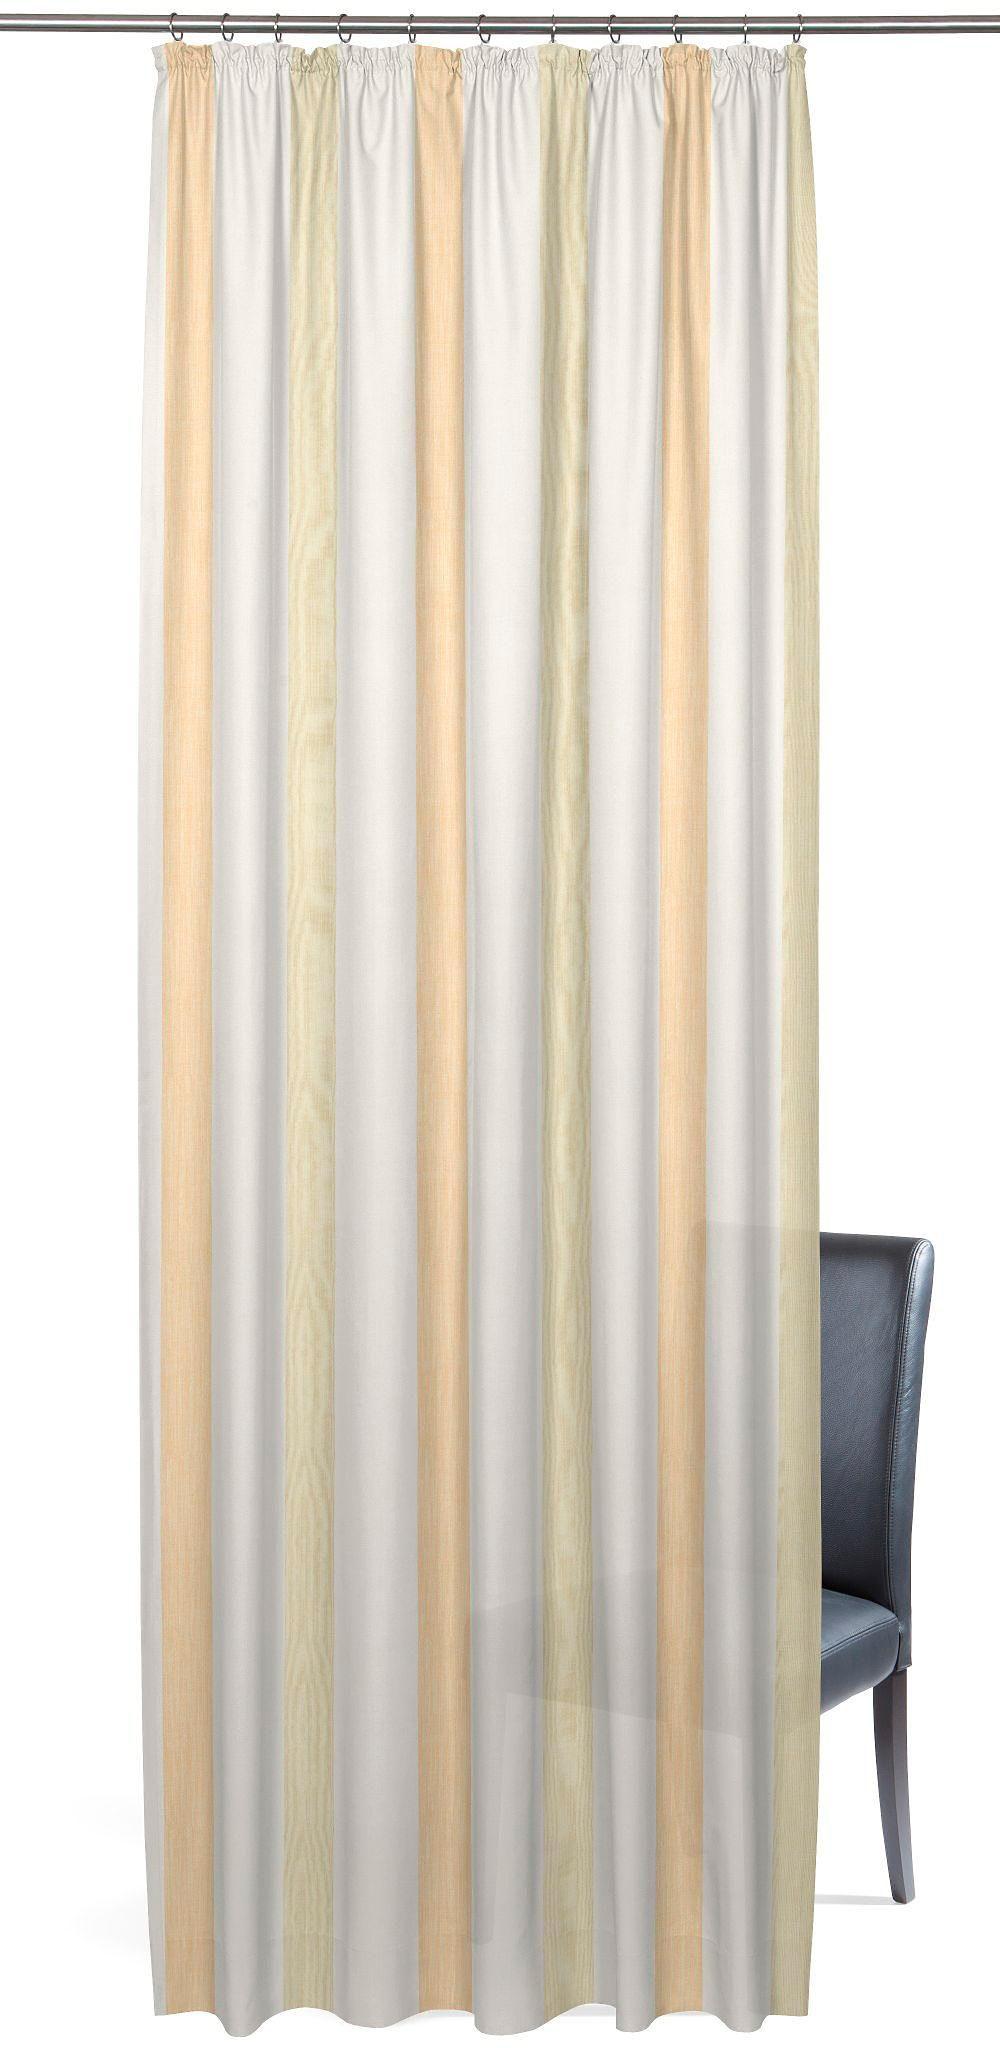 Vorhang, »Garden Stripe«, Gardisette, Kräuselband 1 Stück